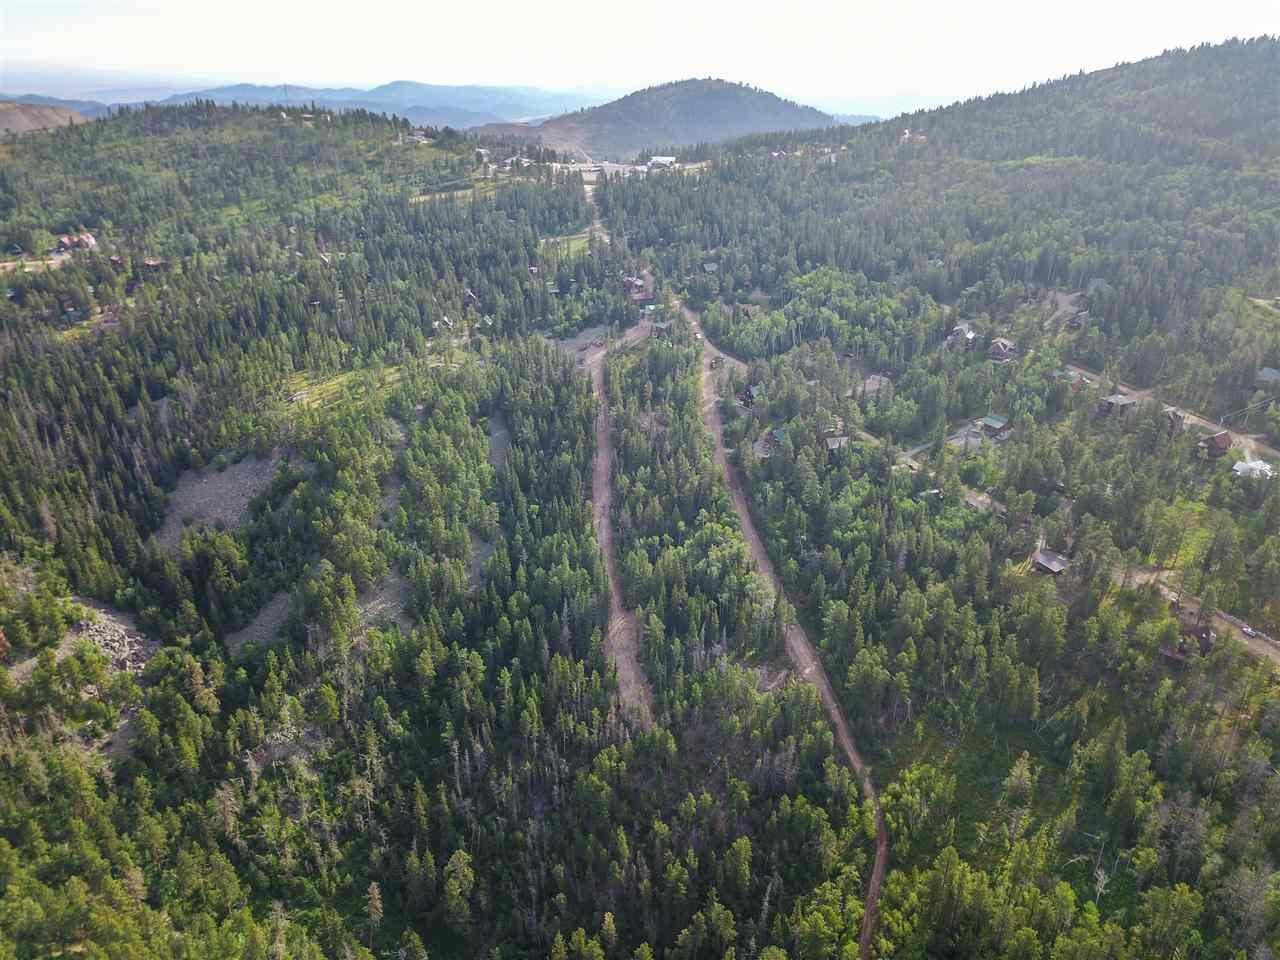 TBD 17 Lost Camp Trail